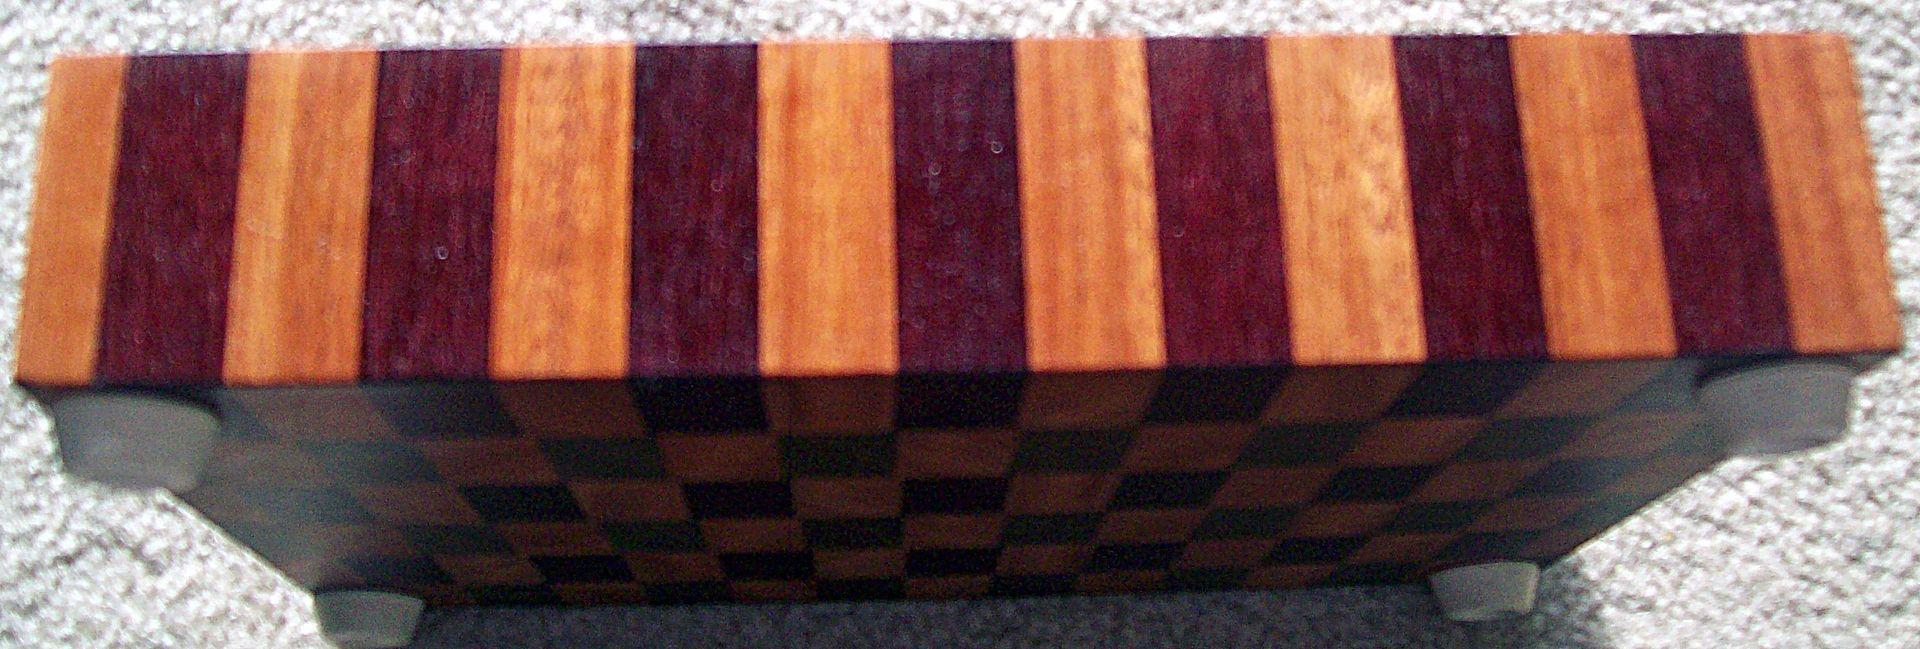 Handmade Mahogany Walnut Purple Heart End Grain Board by Jlb Woodworking  Carpentry